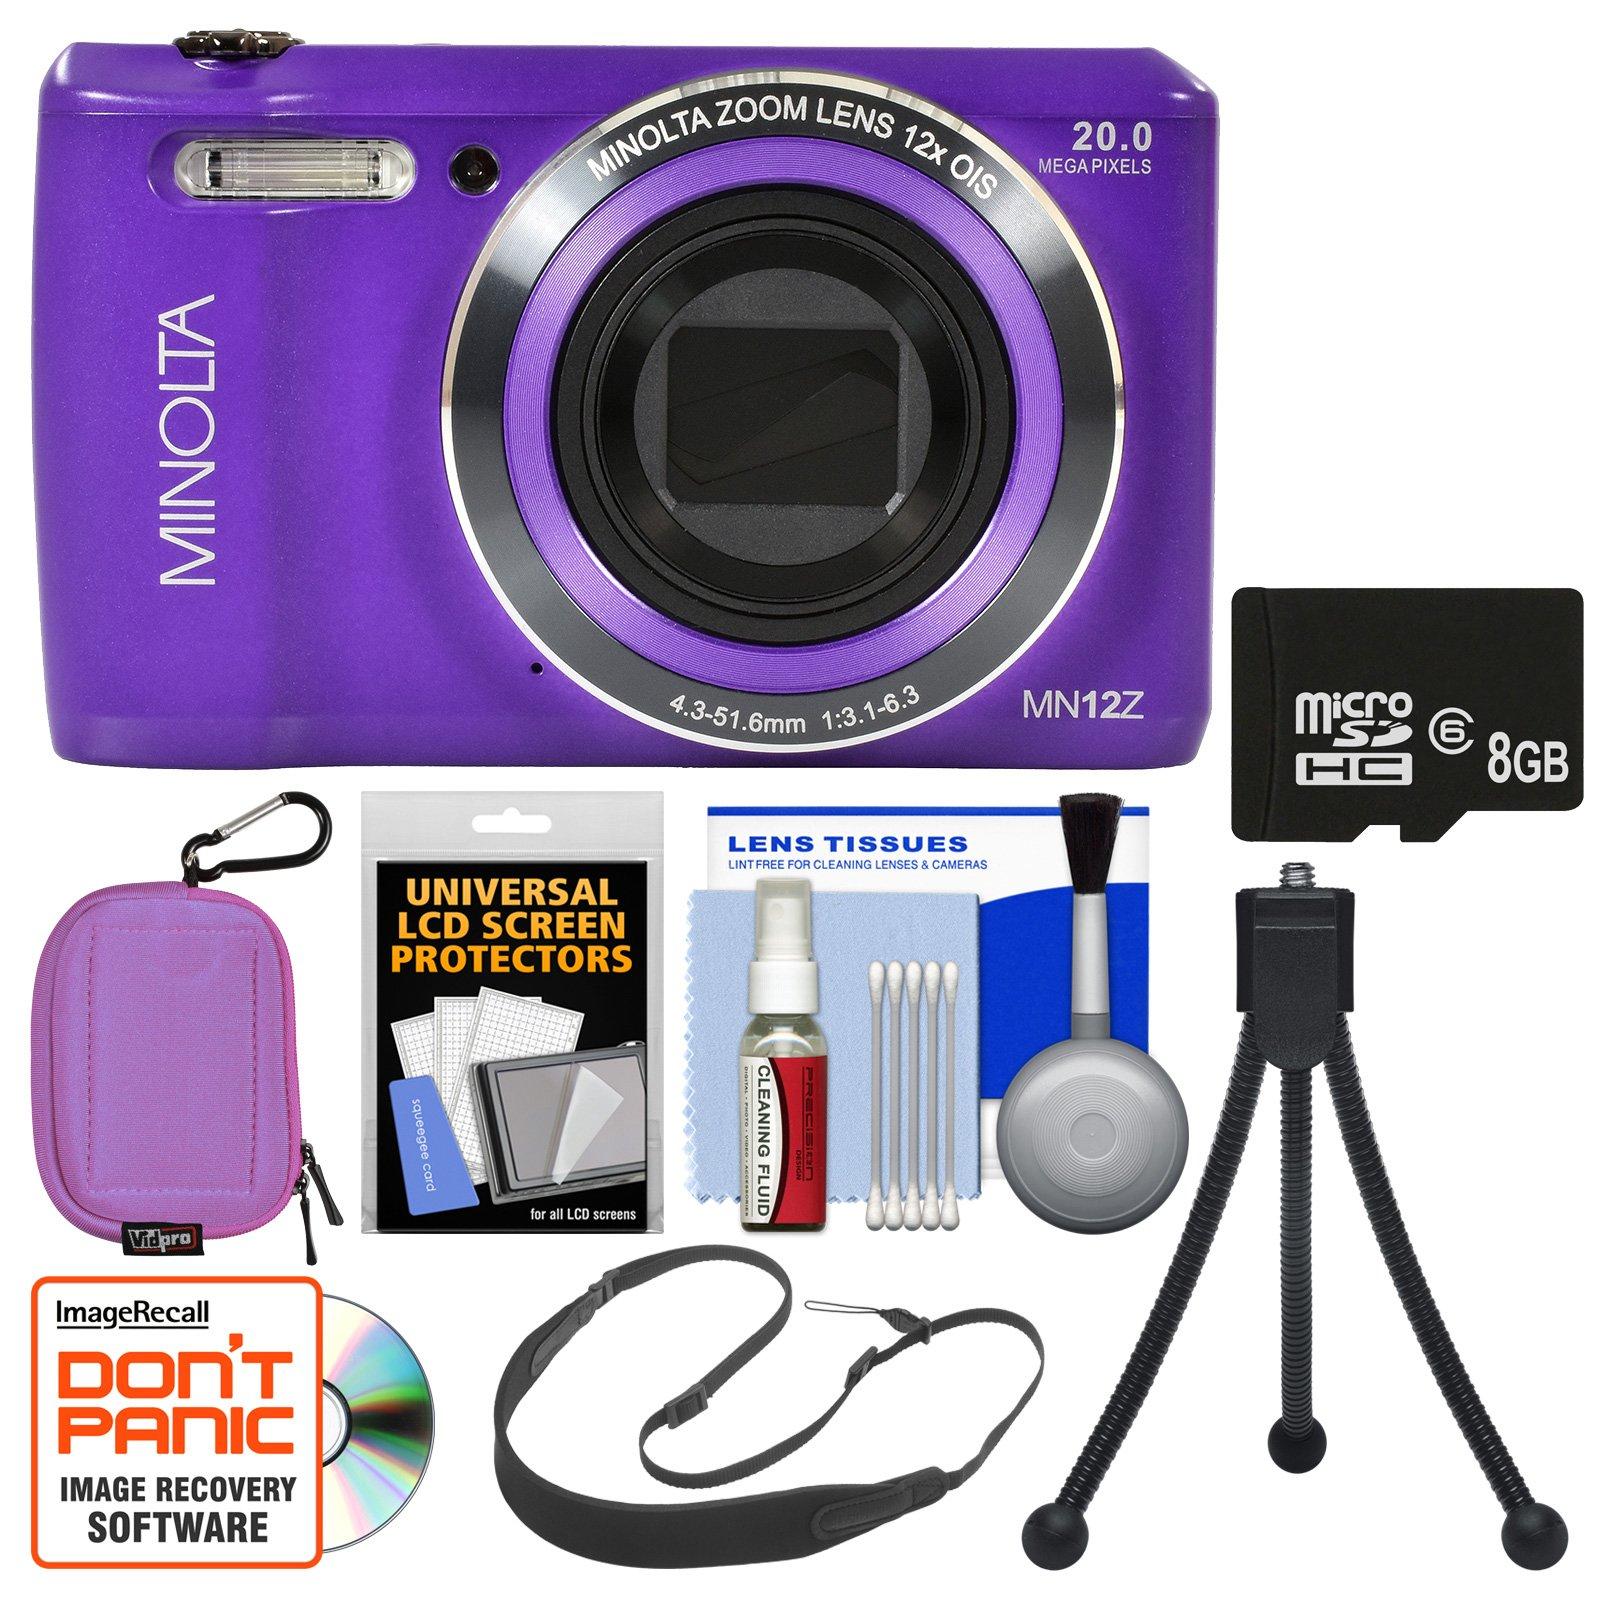 Minolta MN12Z OIS 12x Zoom Wi-Fi Digital Camera (Purple) with 8GB Card + Case + Flex Tripod + Sling Strap + Kit by Minolta